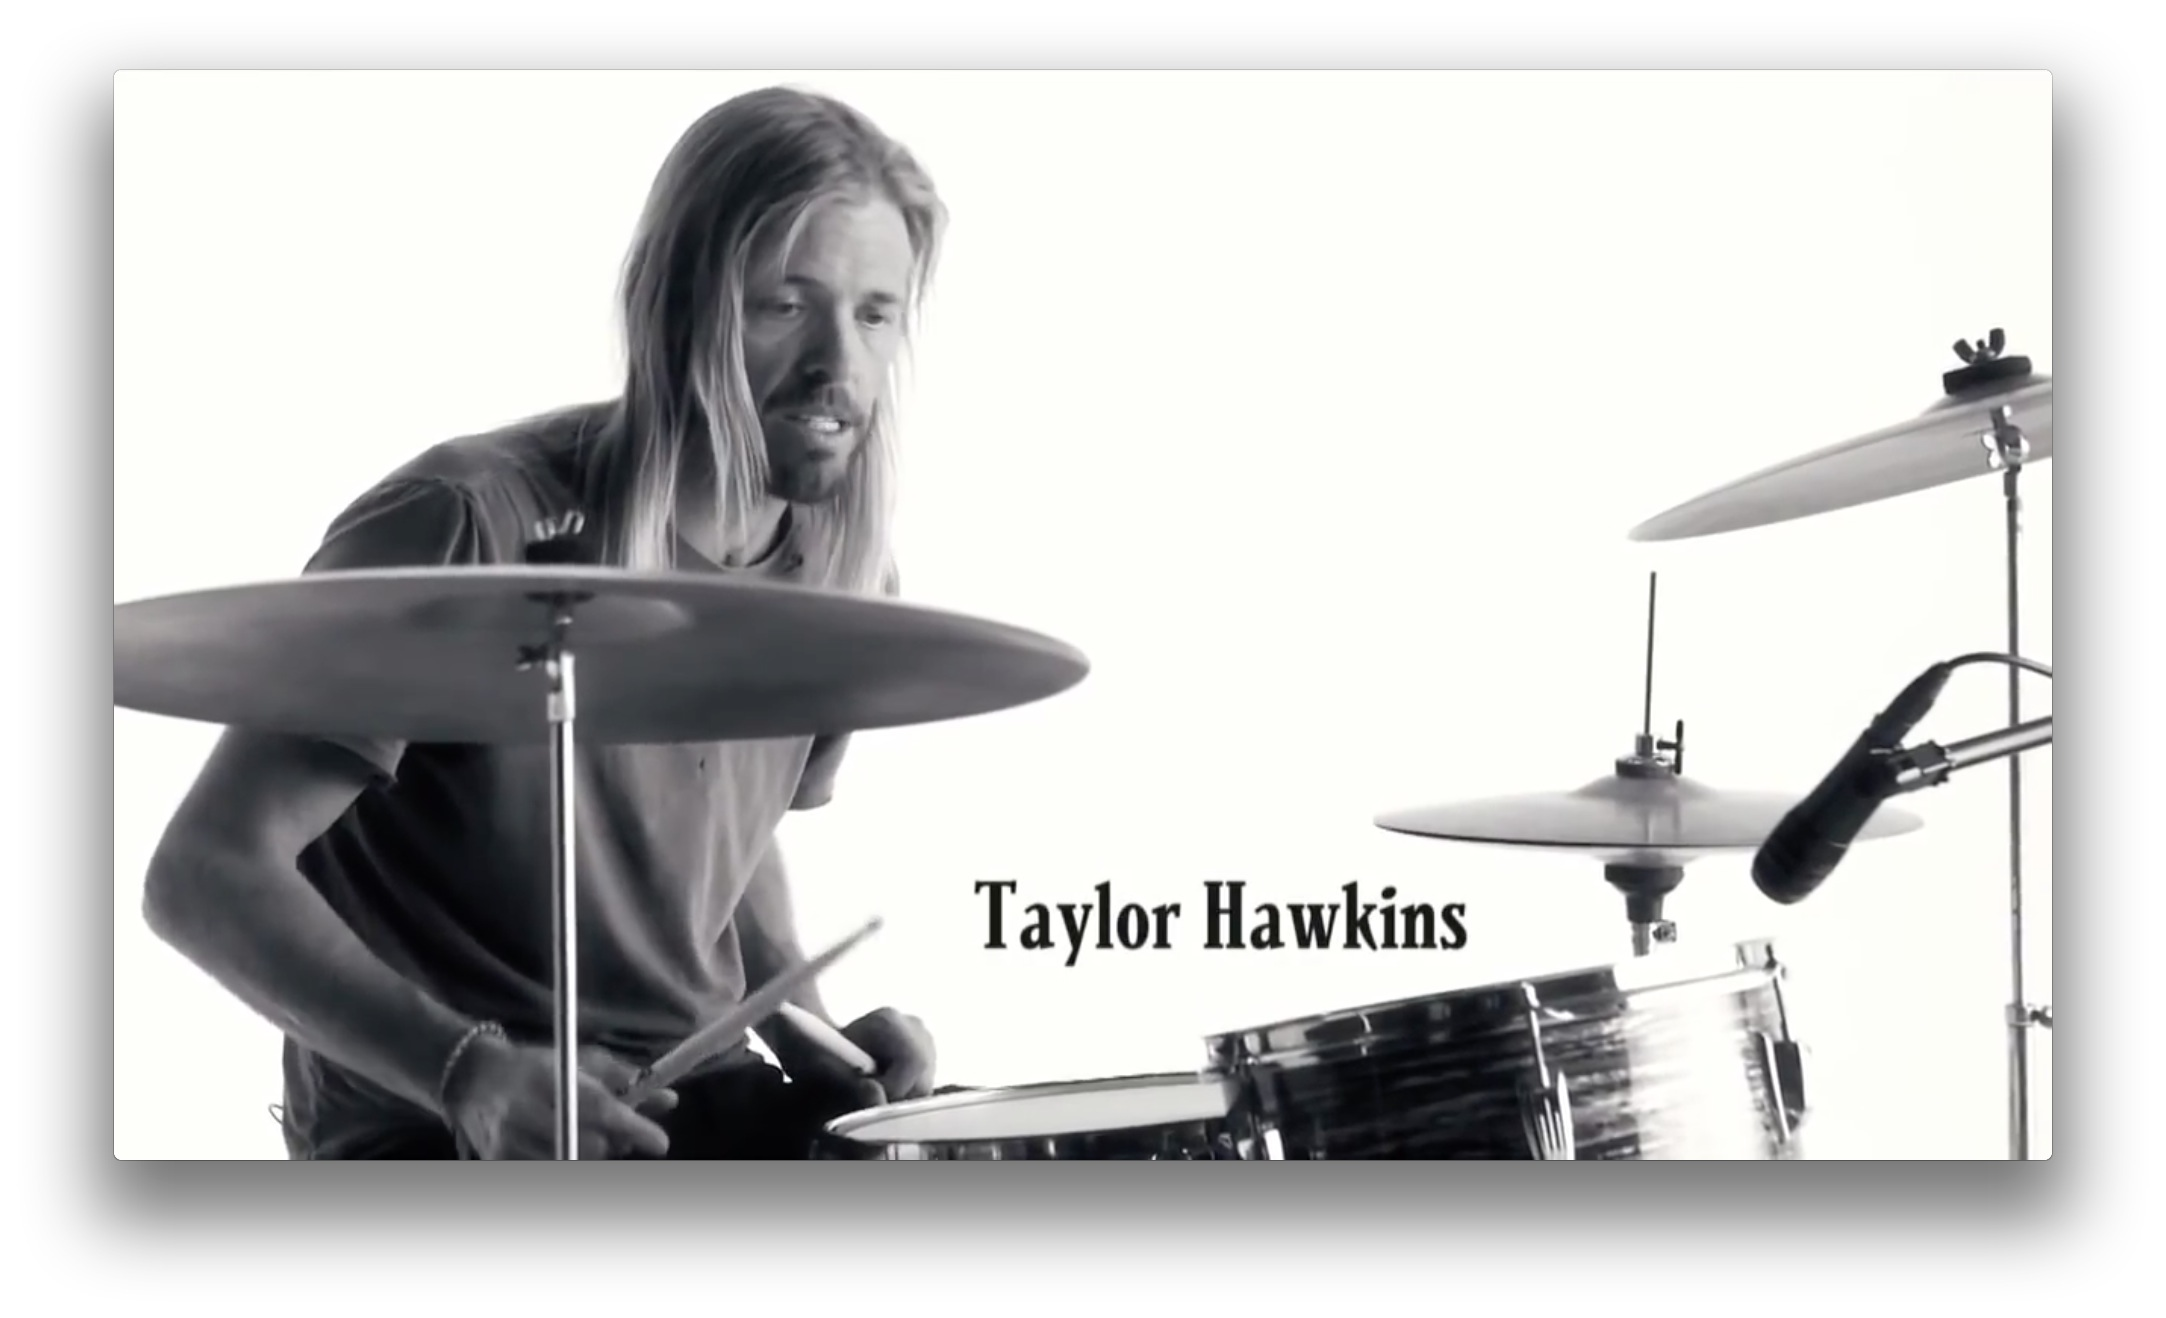 Ringo_Taylor Hawkins